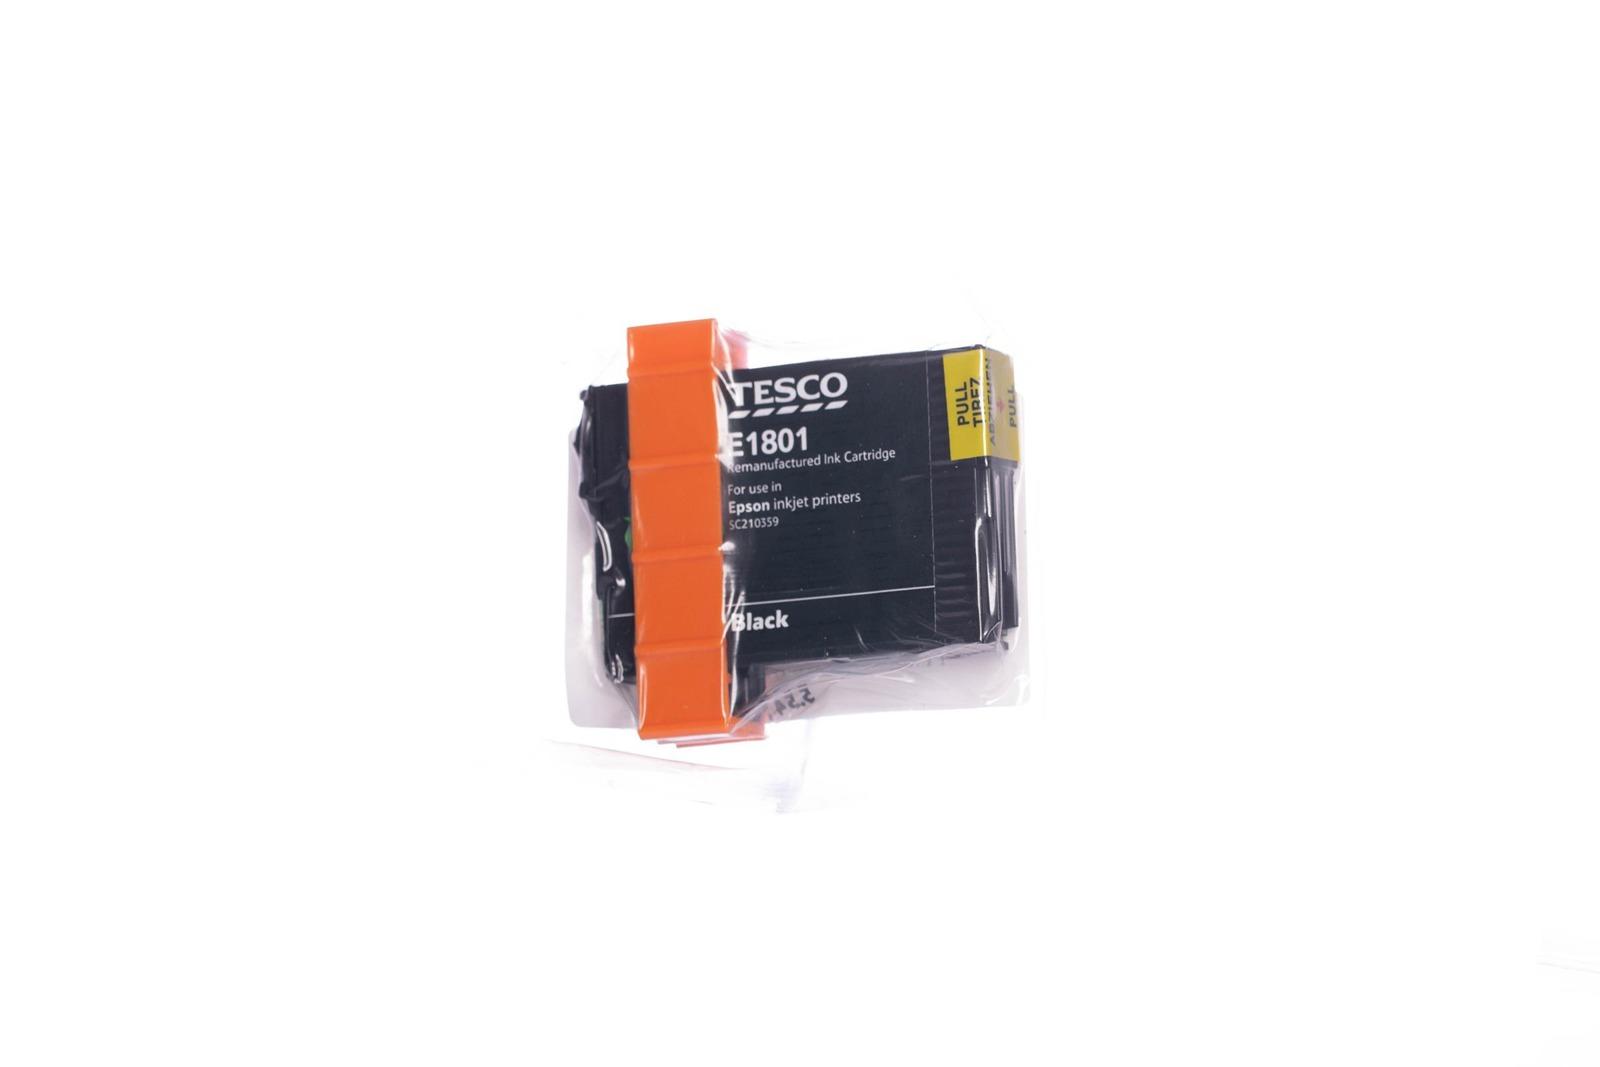 Remanufactured Ink cartridge Tesco Epson T1801 Black